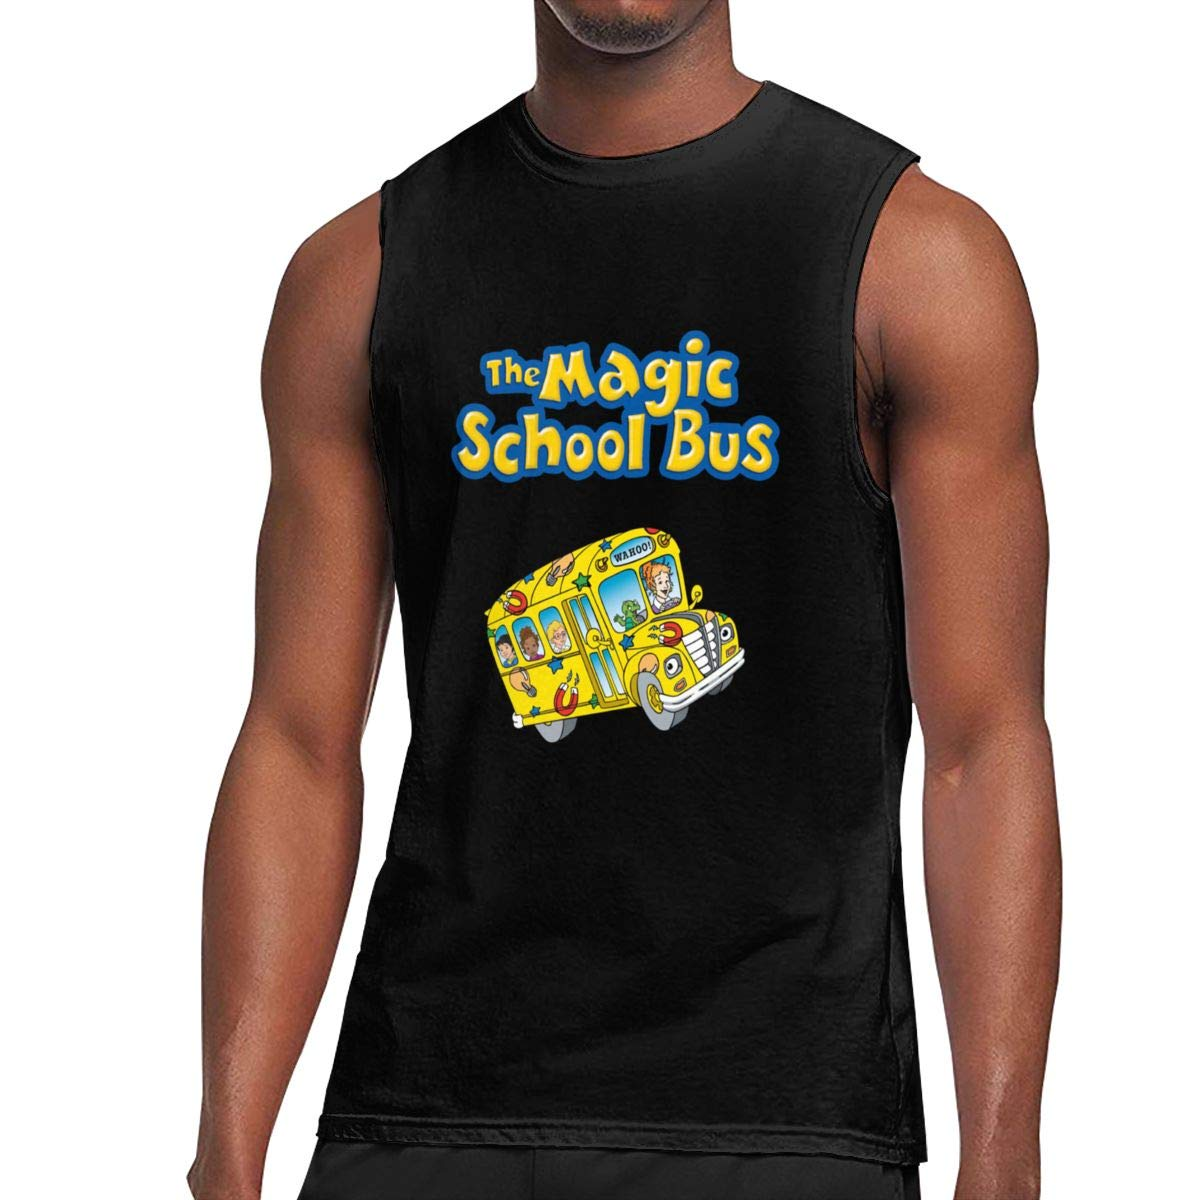 Seuriamin The Magic School Bus S Funny Gym Sleeveless Muscle Short Sleeve Shirt